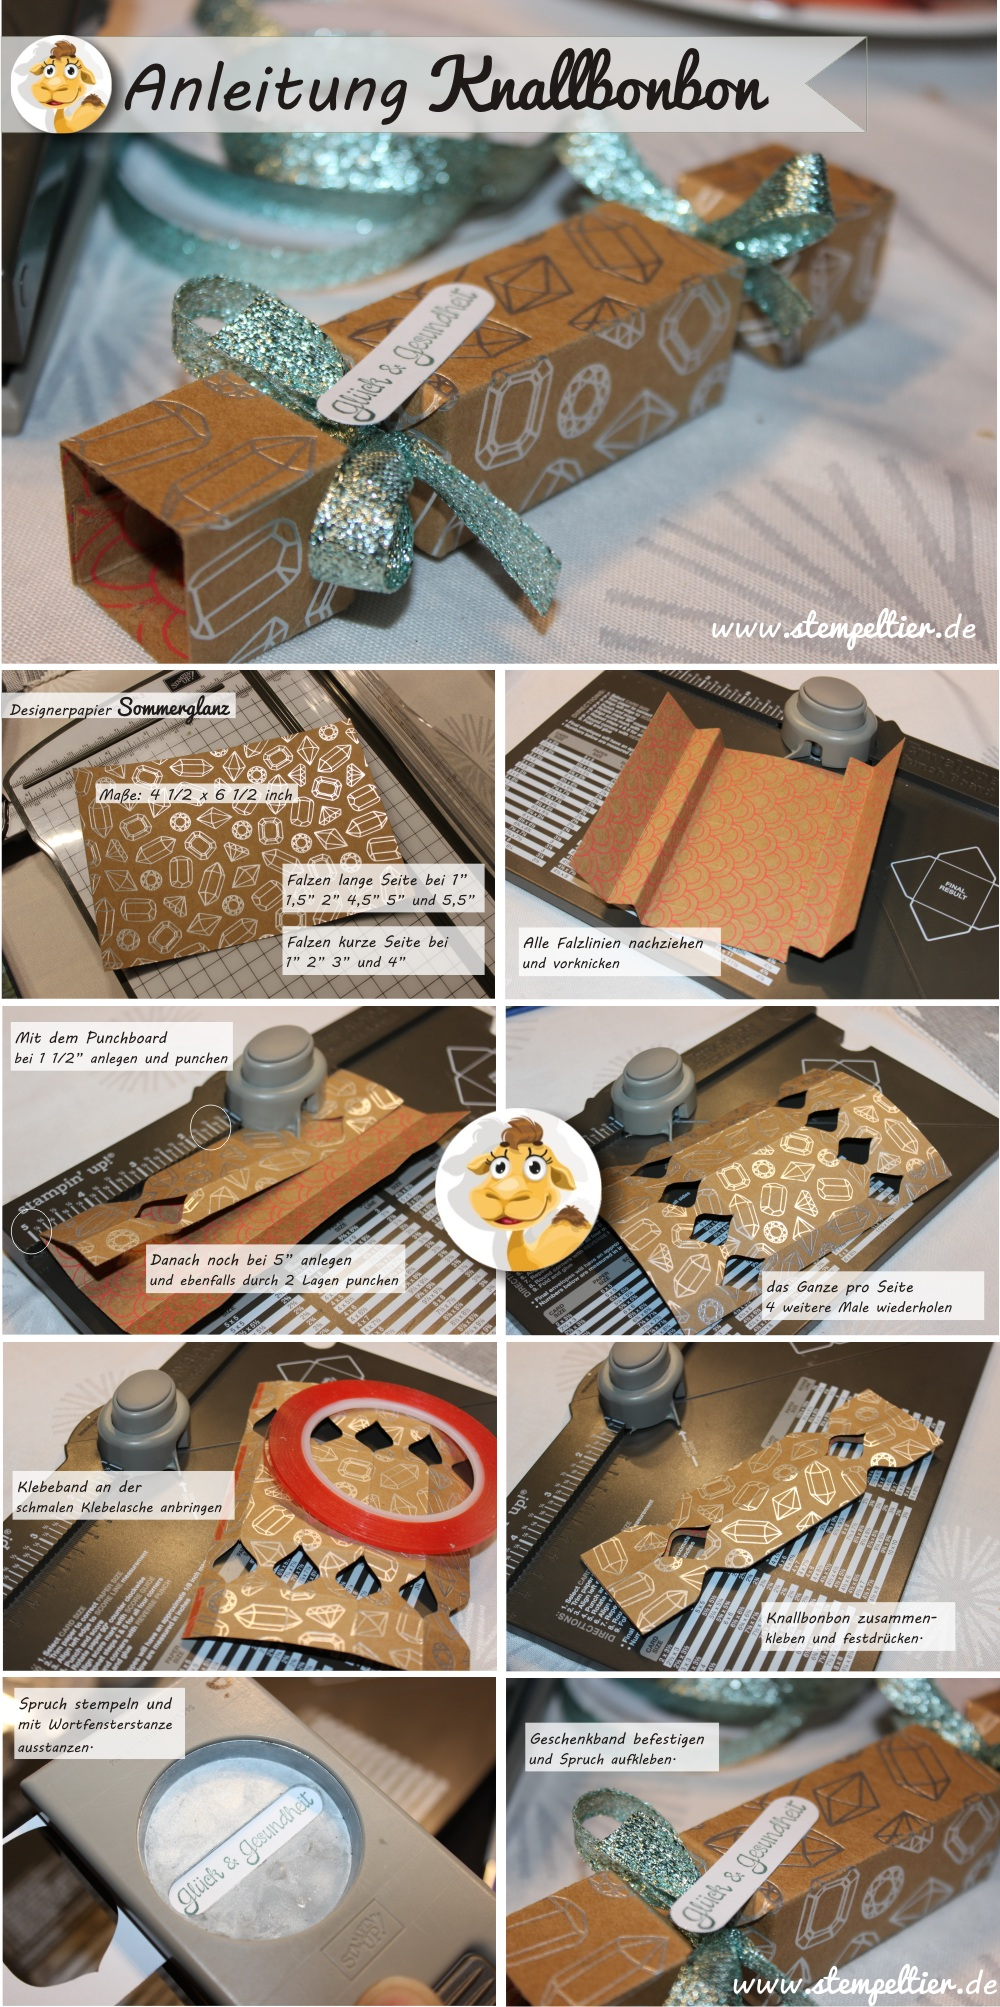 stampin up anleitung knallbonbon silvester how to tutorial stempeltier designerpapier sommerglanz frühjahr sommer 2016 SAB saleabration